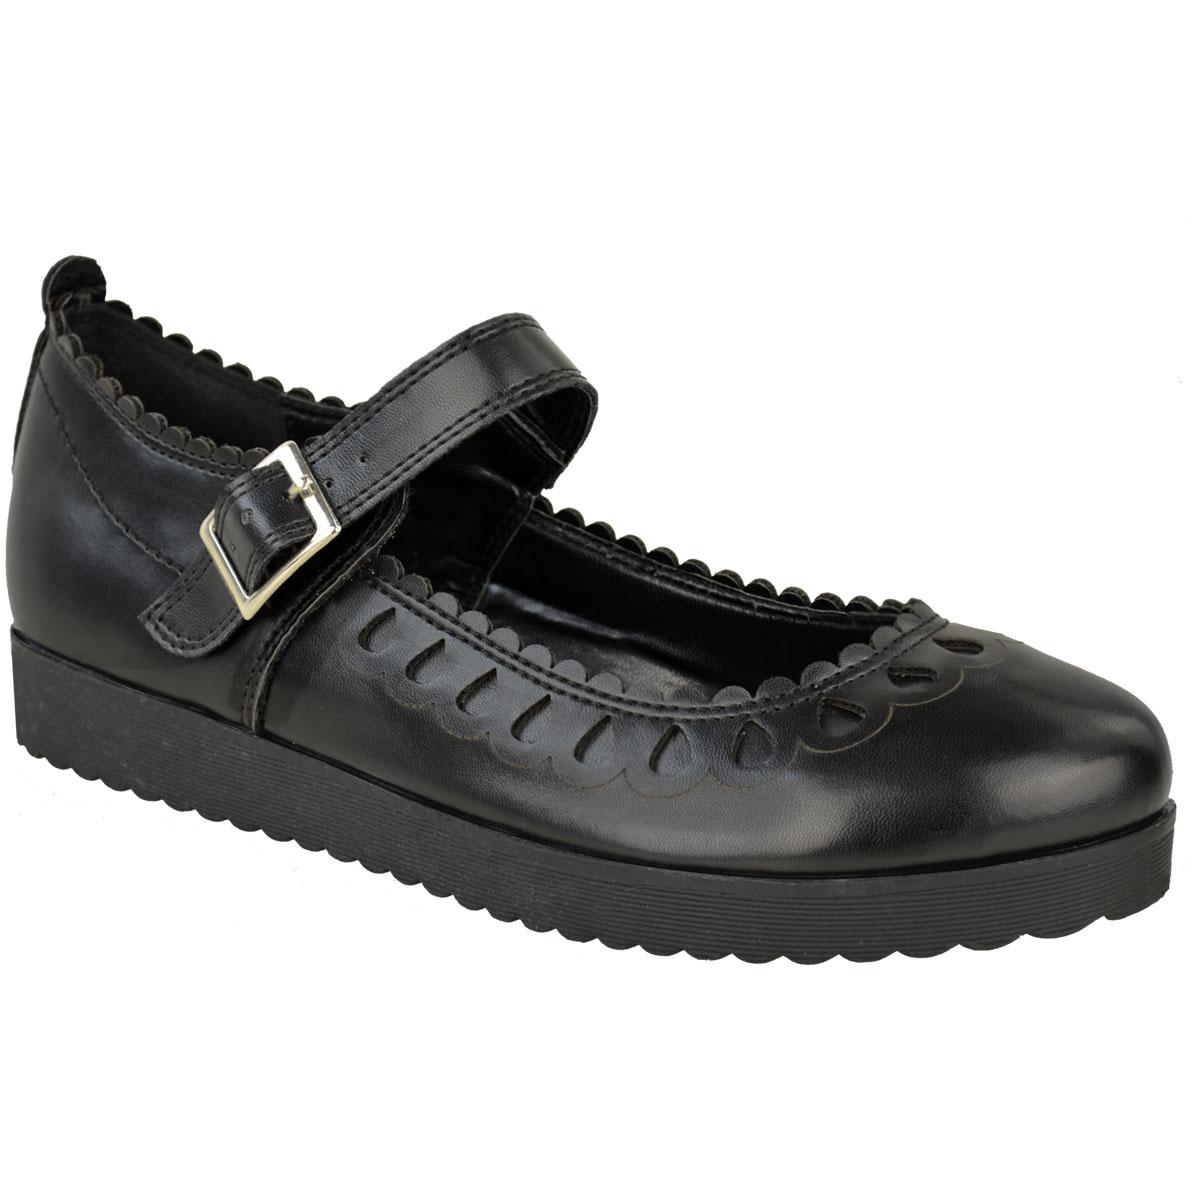 New-Womens-Ladies-Girls-Flats-Shoes-Pumps-School-Work-Office-Geek-Low-Heels-Size thumbnail 6